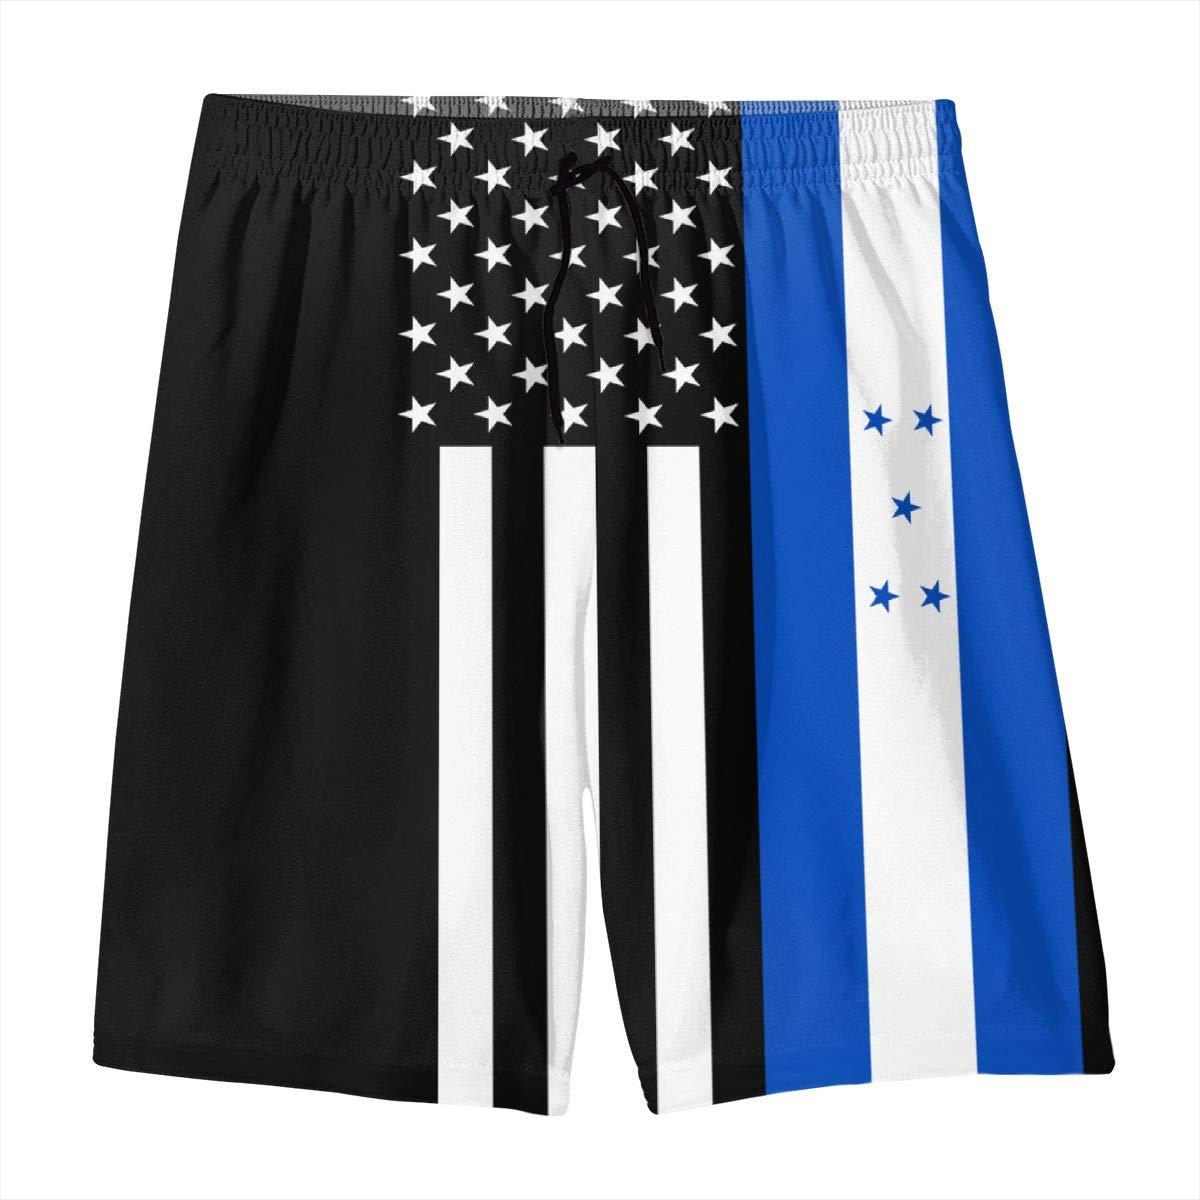 BLACK-DO Mens Summer USA Honduras Flag Quick Dry Volleyball Beach Shorts Swim Shorts Board Shorts